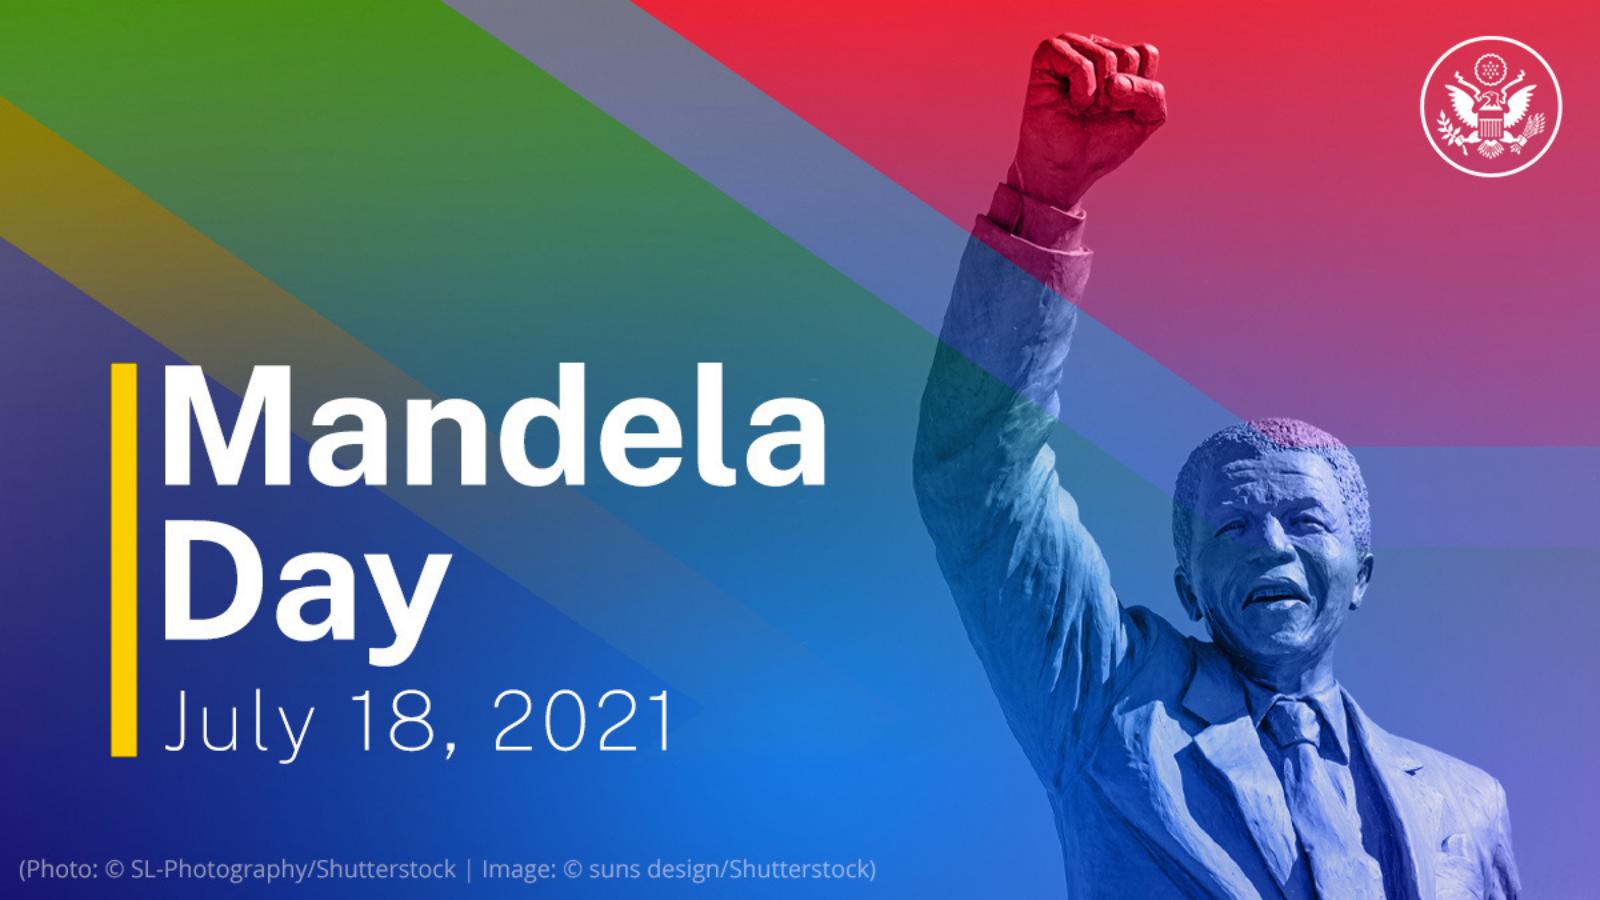 Mandela Day: July 18, 2021